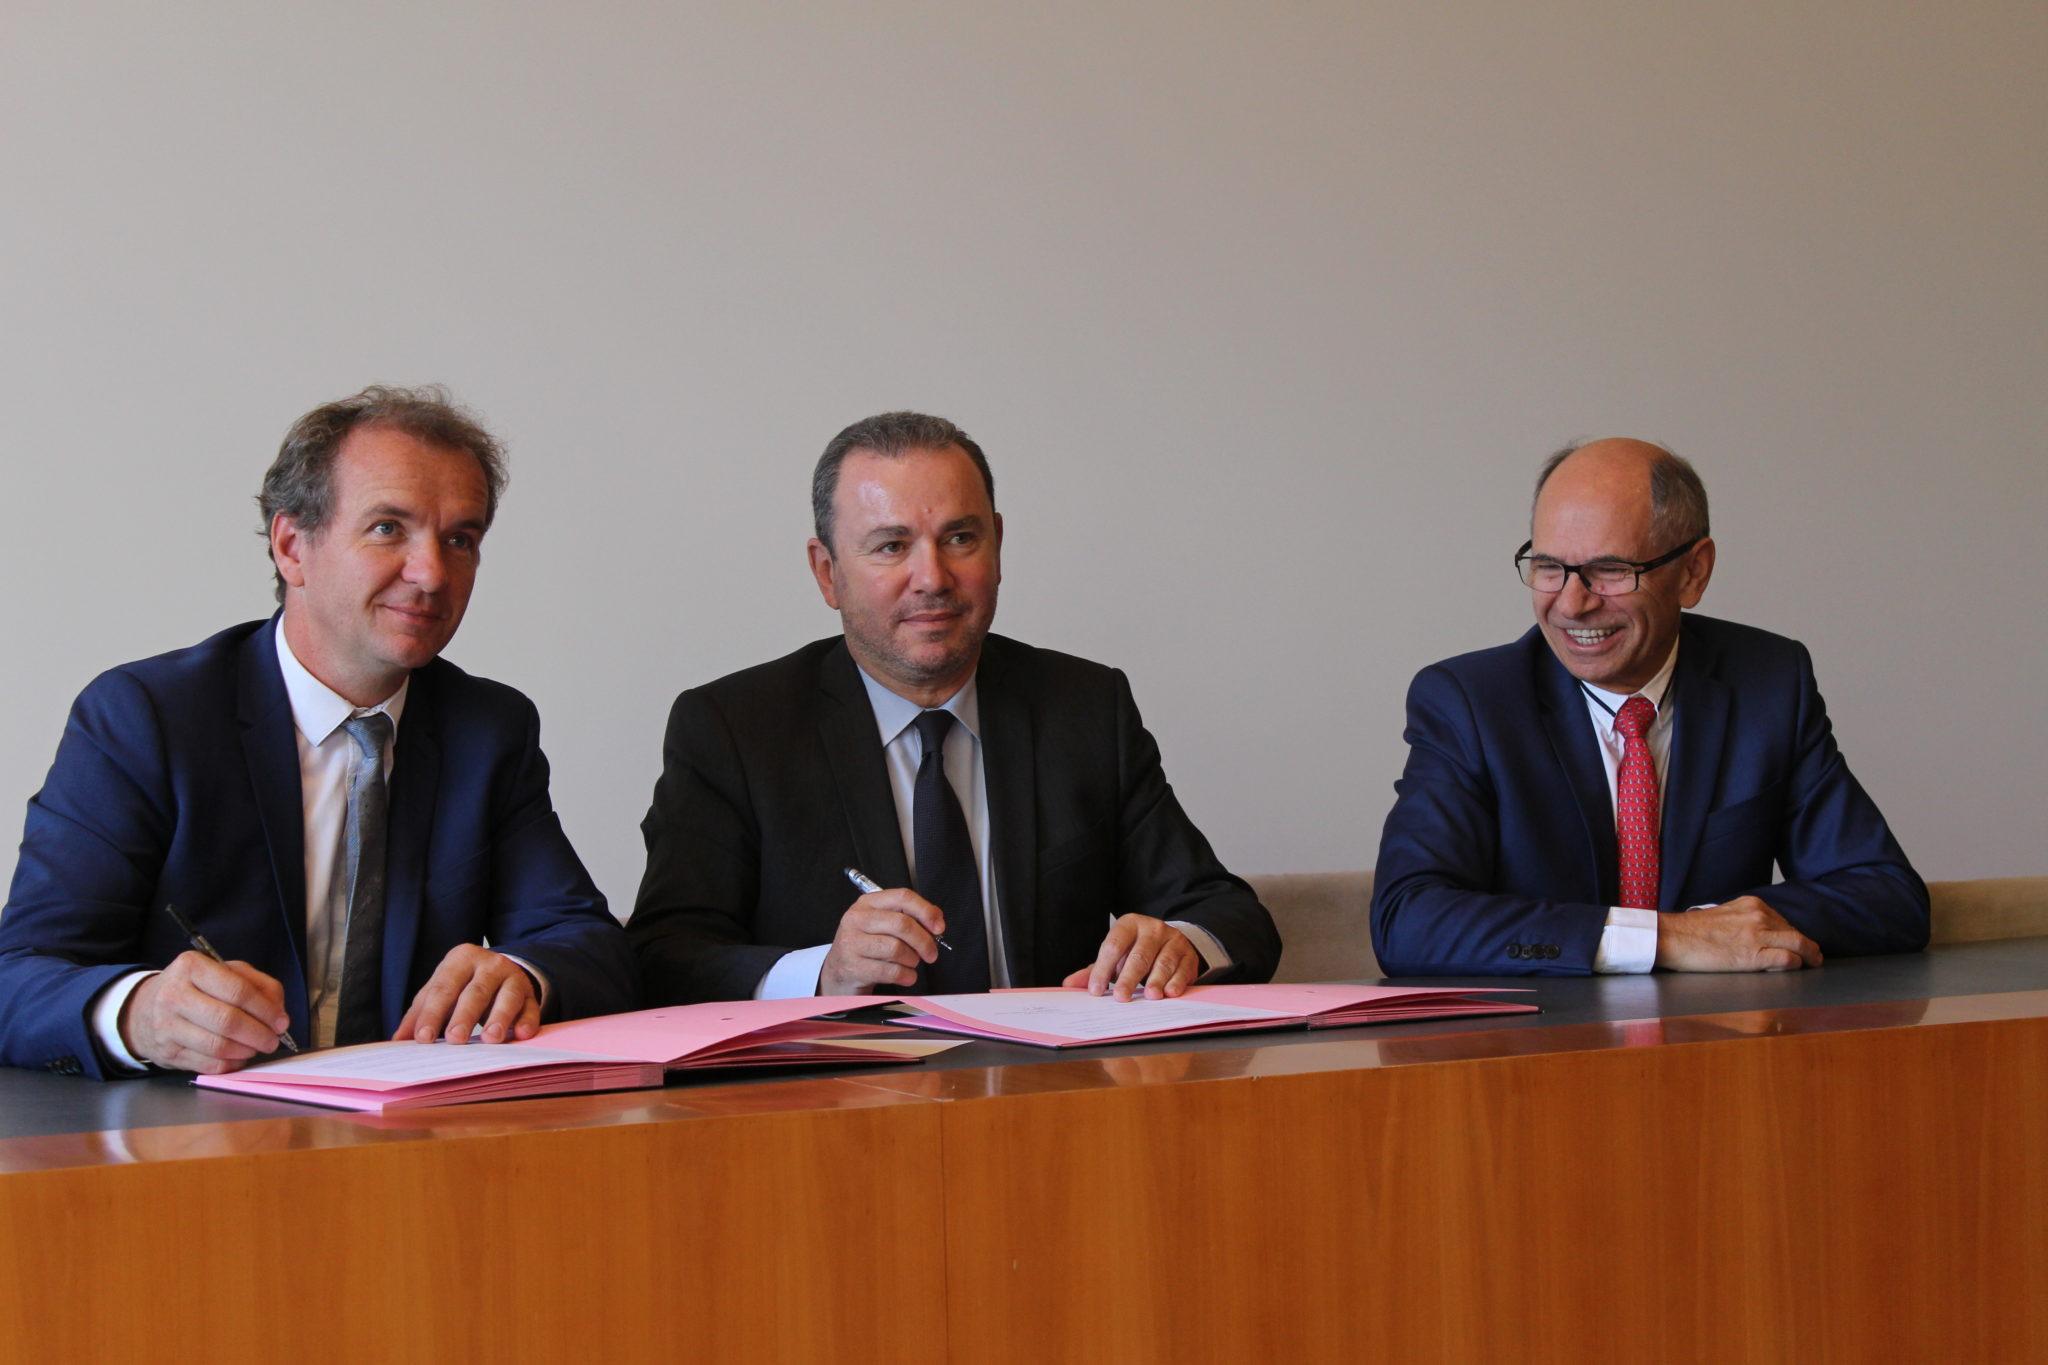 Maxime Toubart, Christophe Lecourtier, Jean-Marie Barillere (C)CIVC (11)